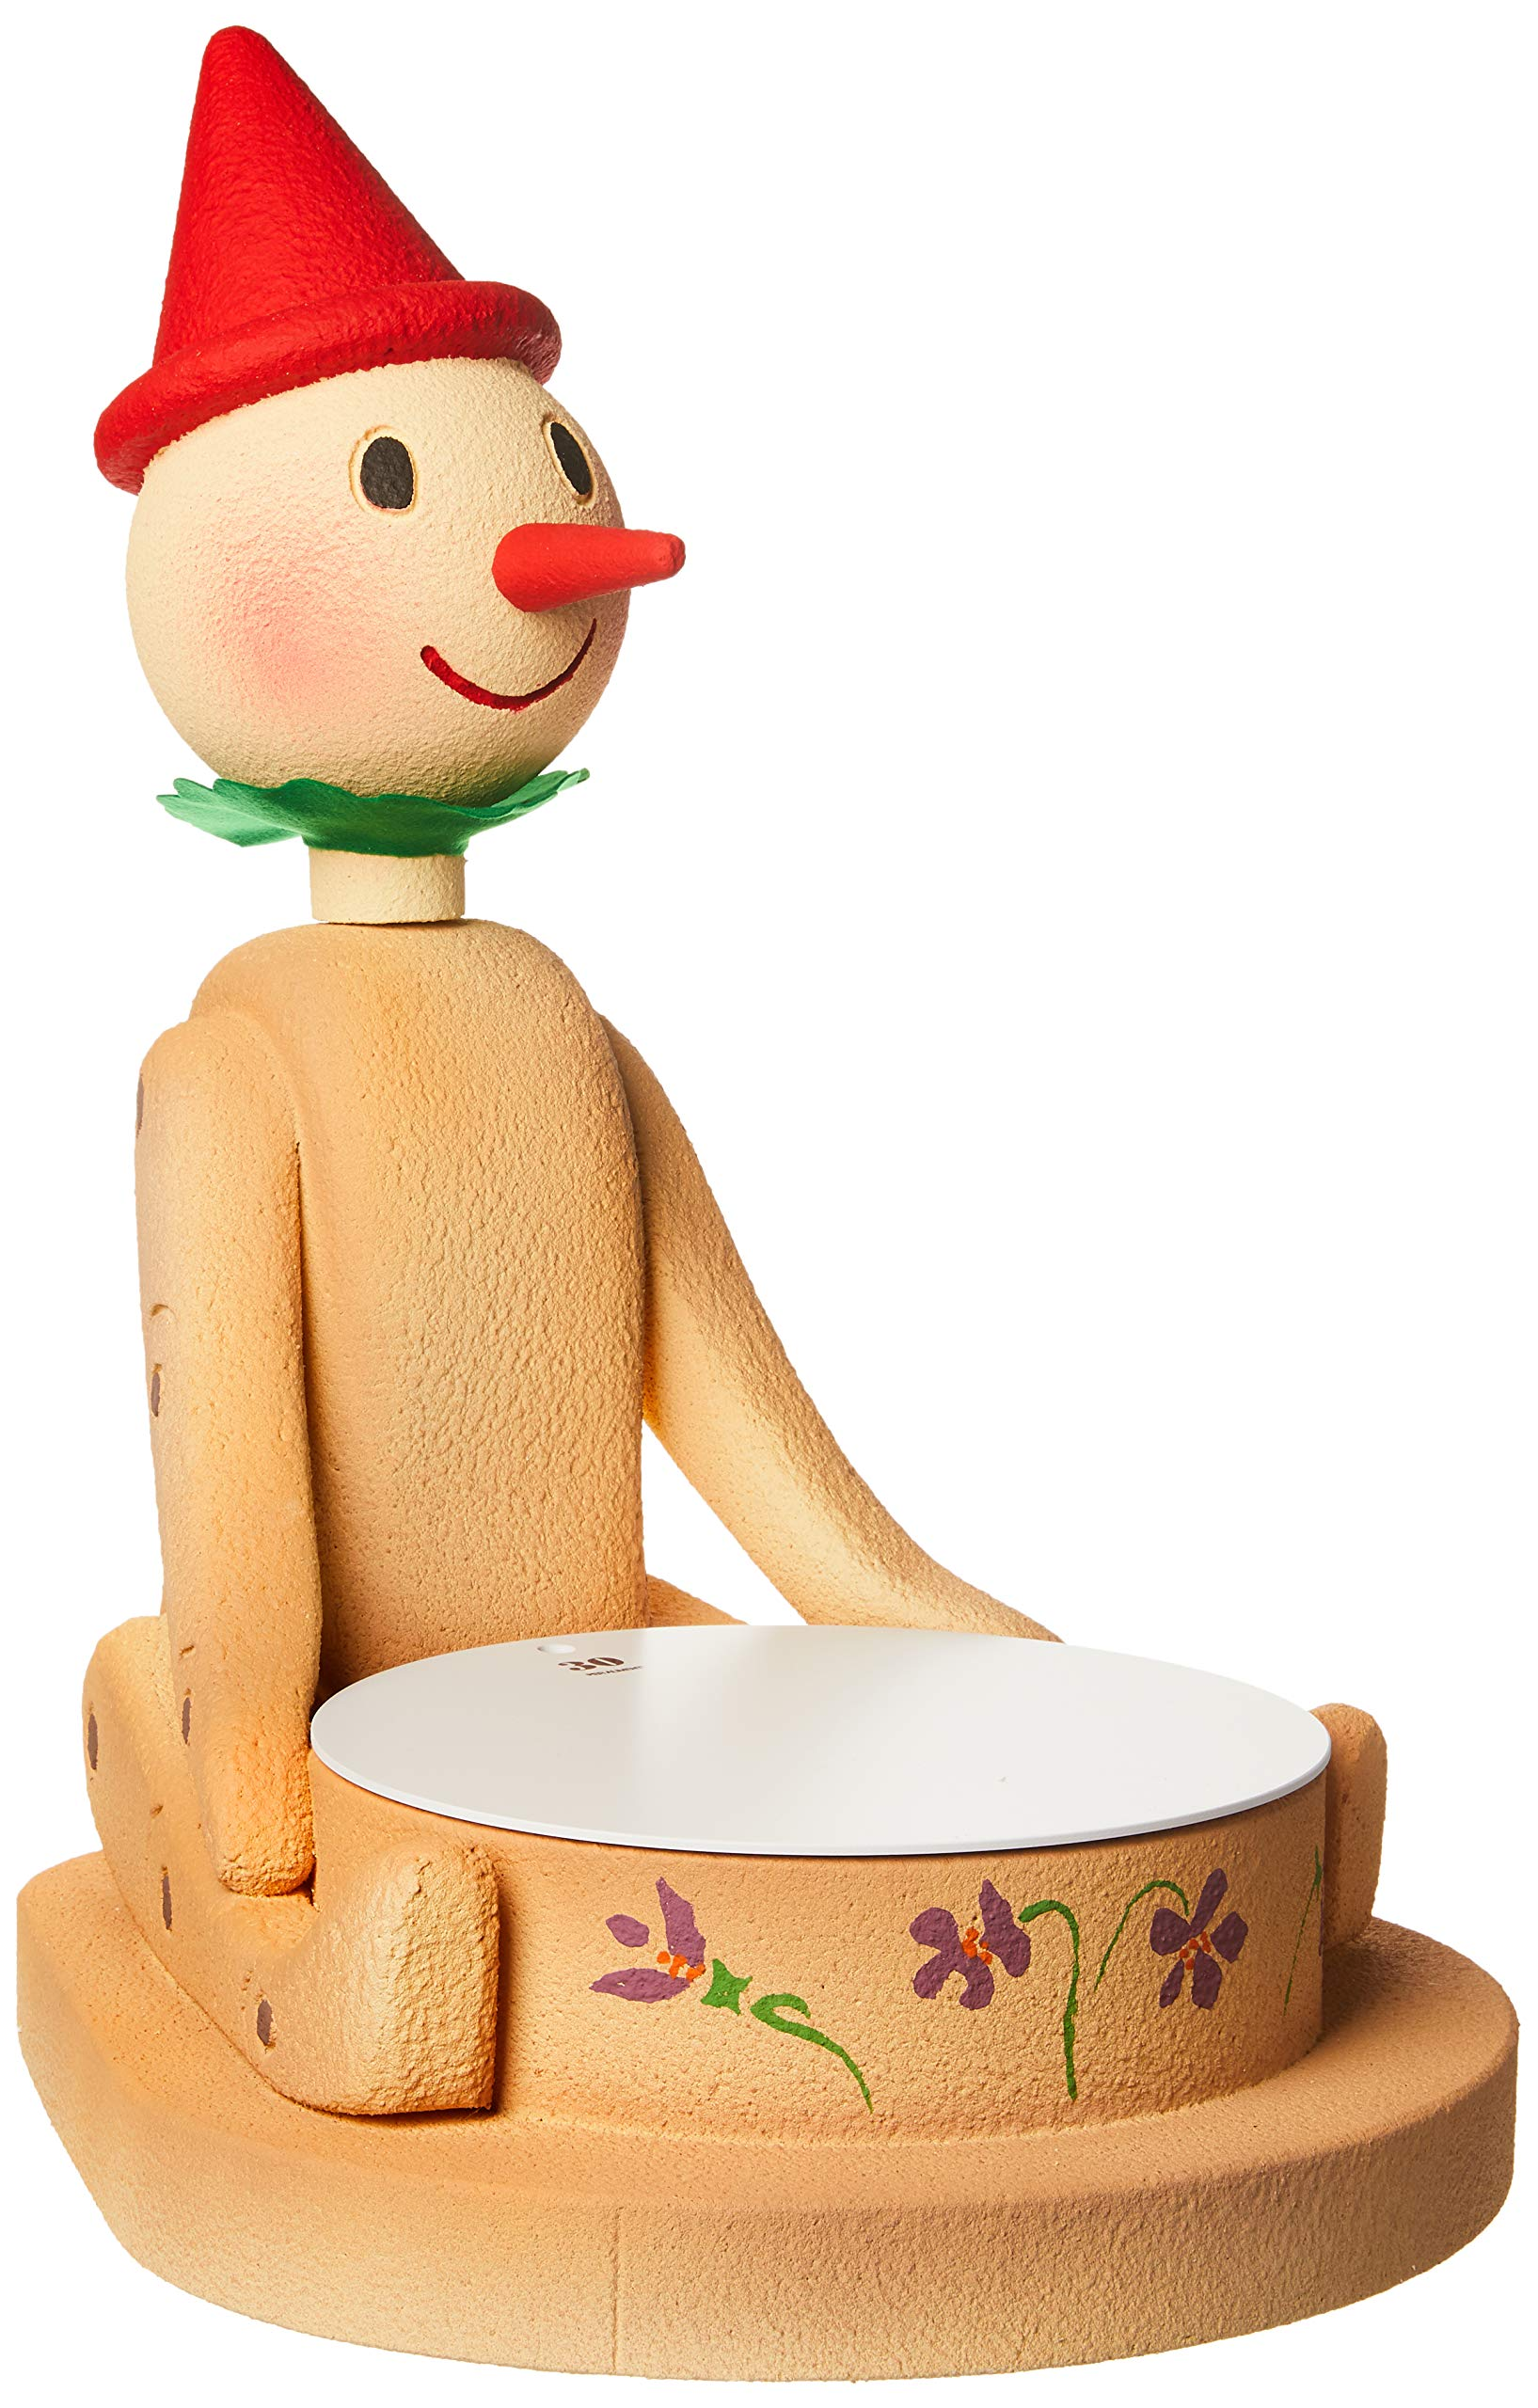 Martellato POLY17 Polystyrene Pinocchio Model Cake Stand, 45 x 51 x 65 cm, Multicoloured